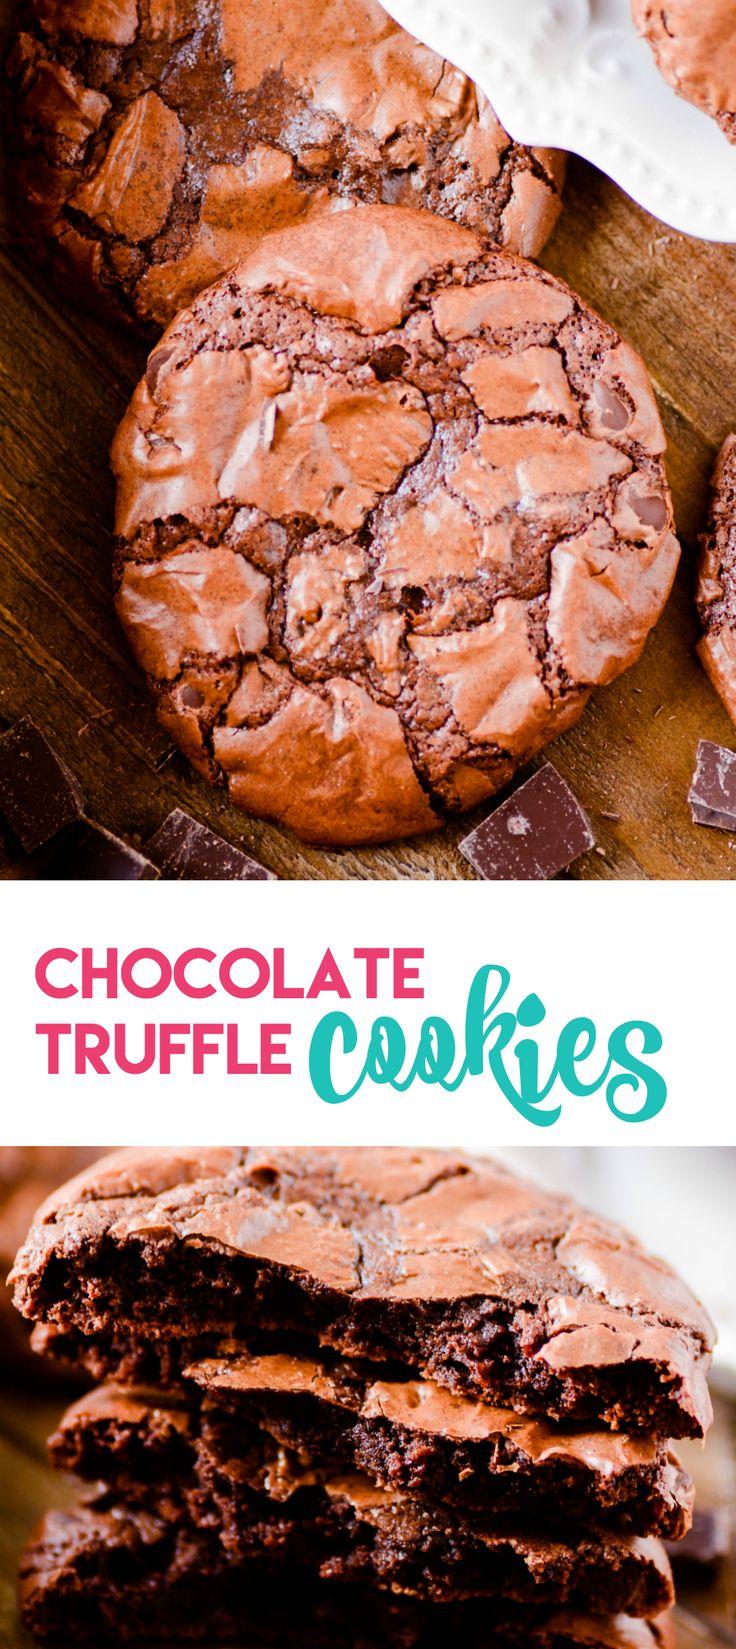 Chocolate Truffle Cookies https://www.somethingswanky.com/chocolate-truffle-cookies/?utm_campaign=coschedule&utm_source=pinterest&utm_medium=Something%20Swanky&utm_content=Chocolate%20Truffle%20Cookies